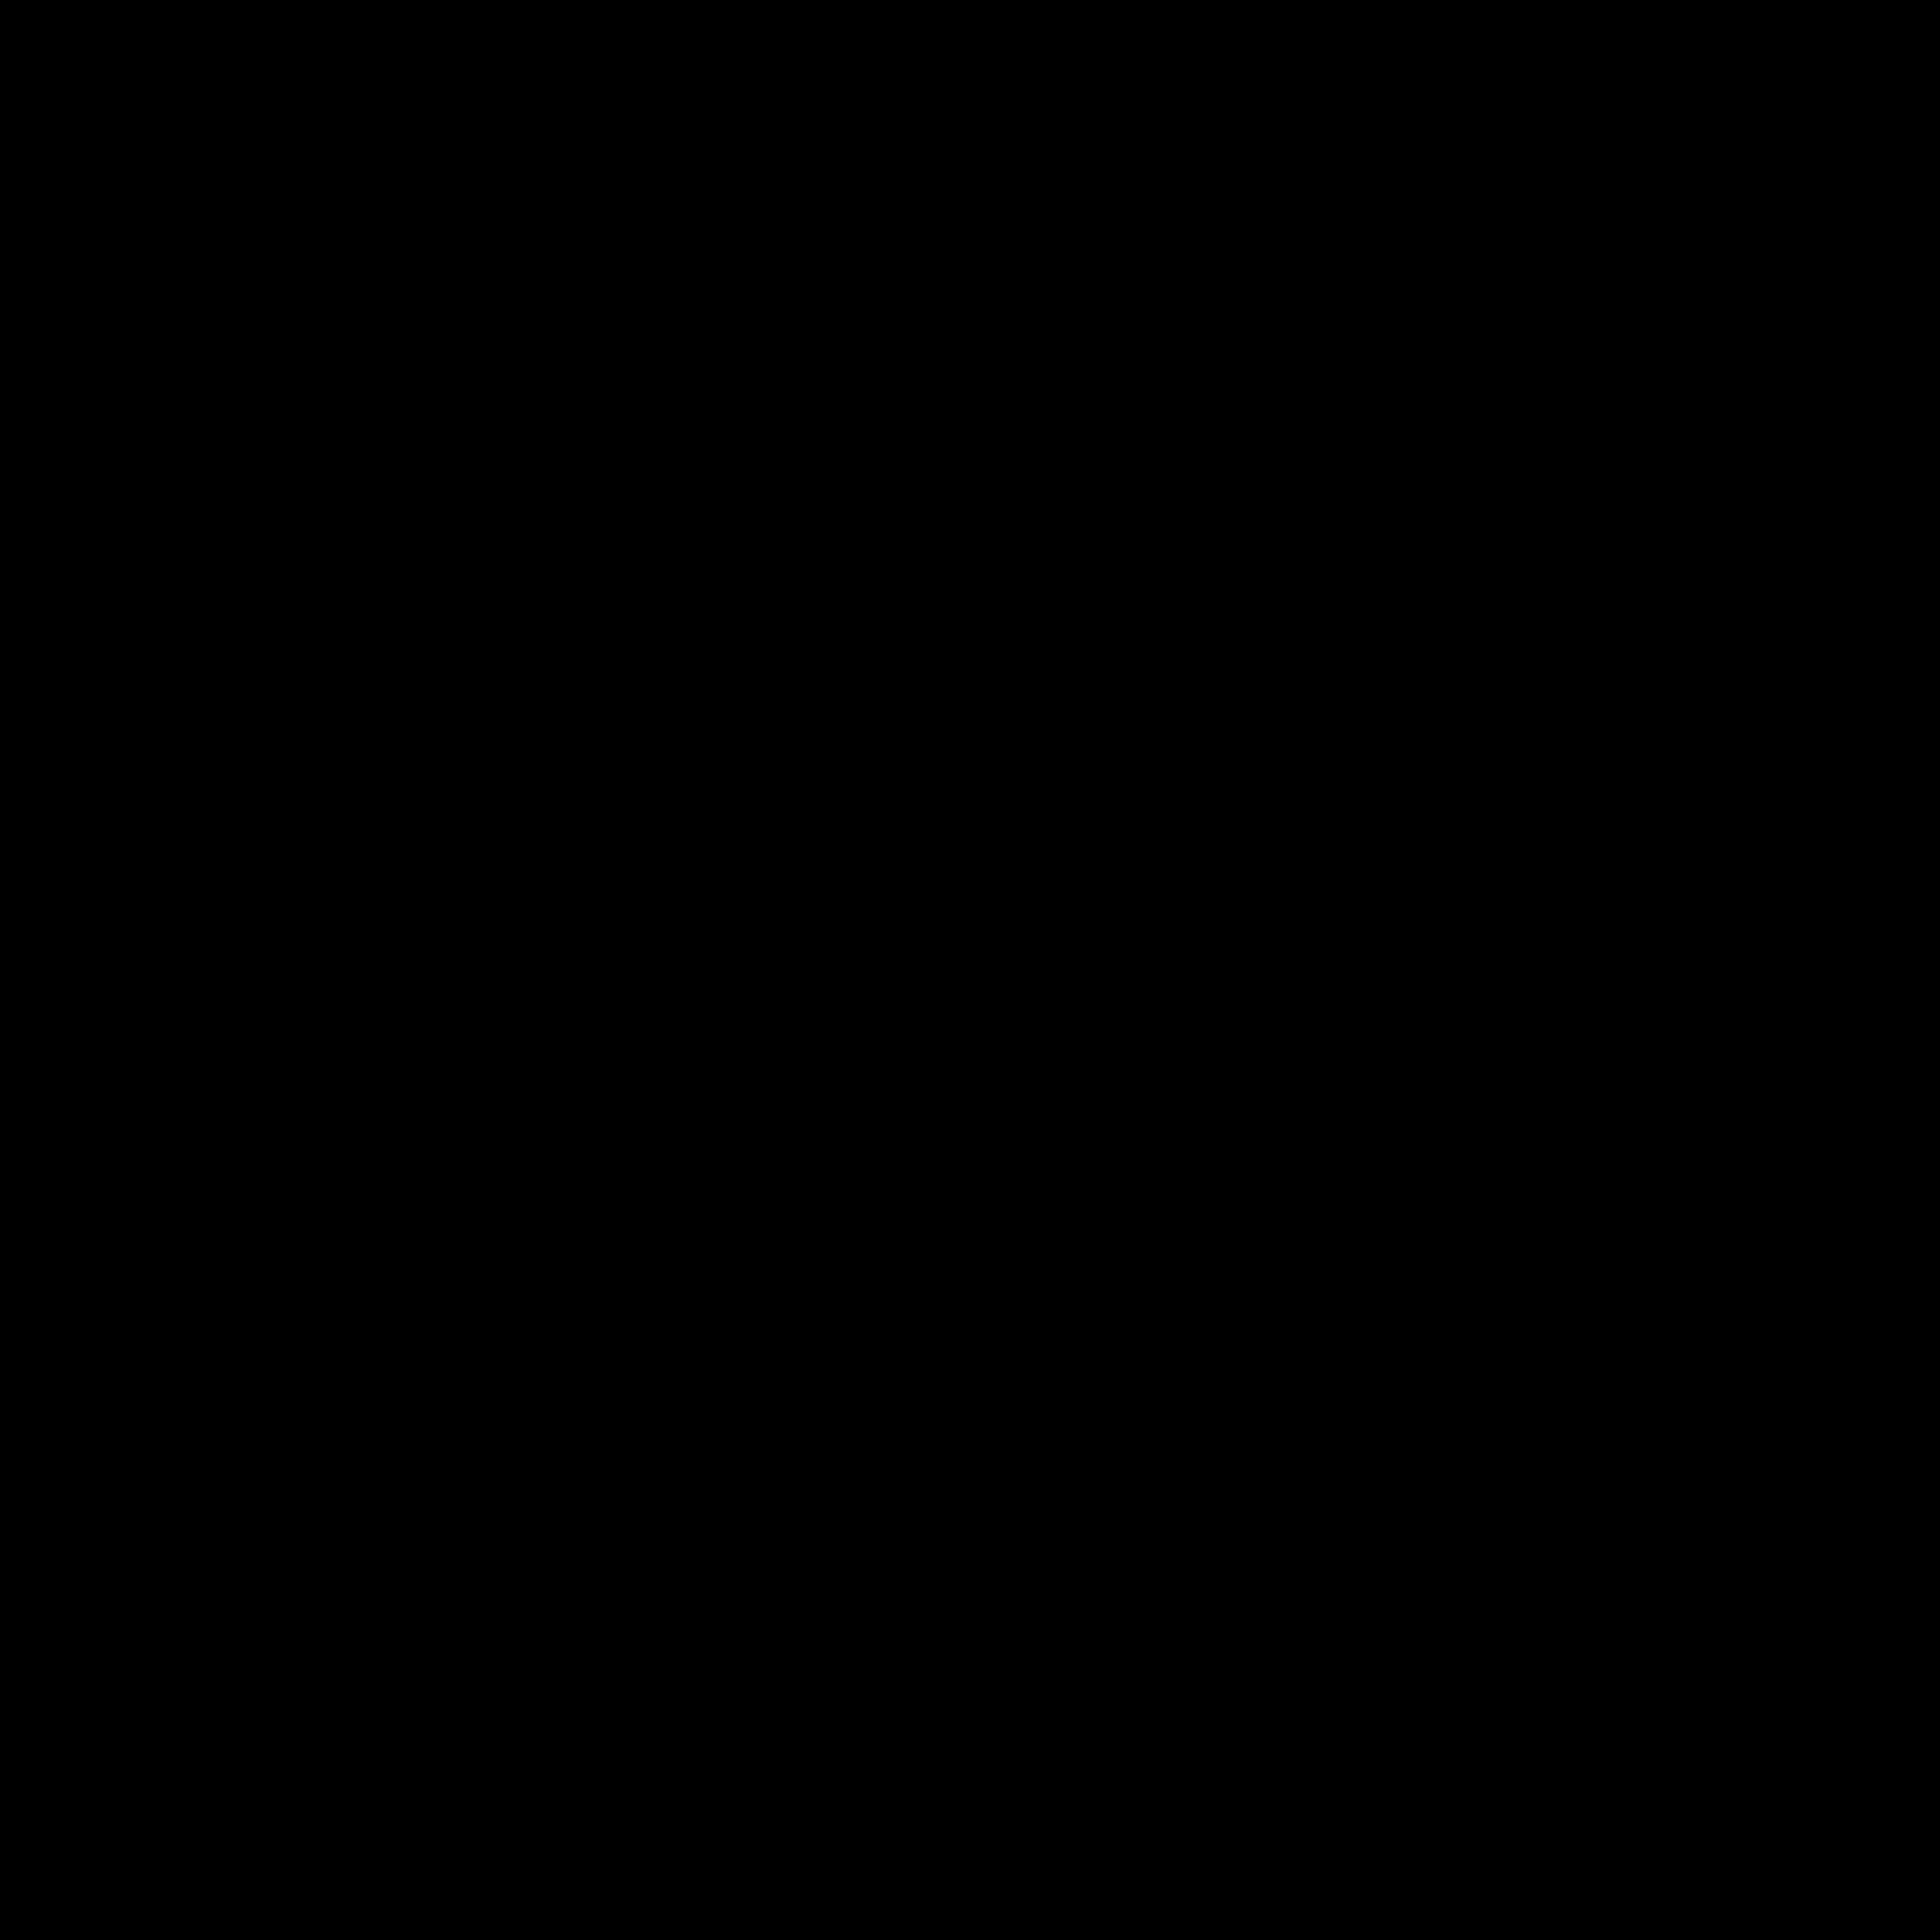 Def Jam Recordings Logo PNG Transparent & SVG Vector.